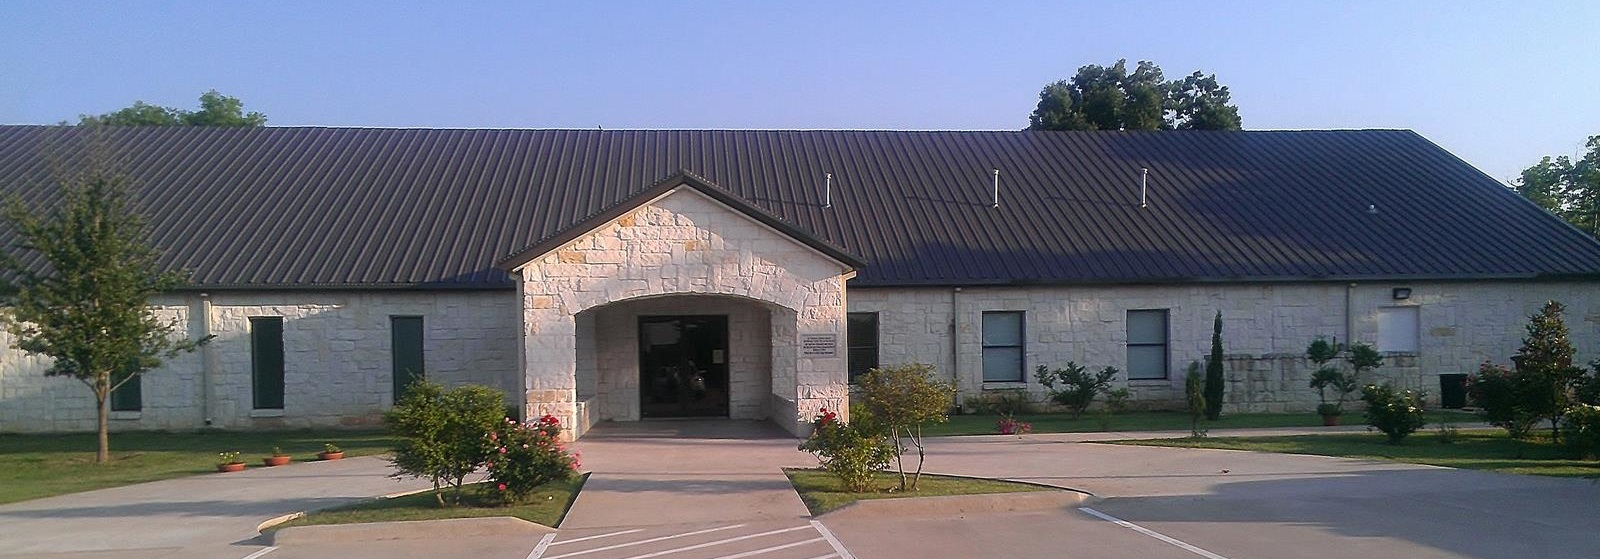 St. Celestine Catholic Church